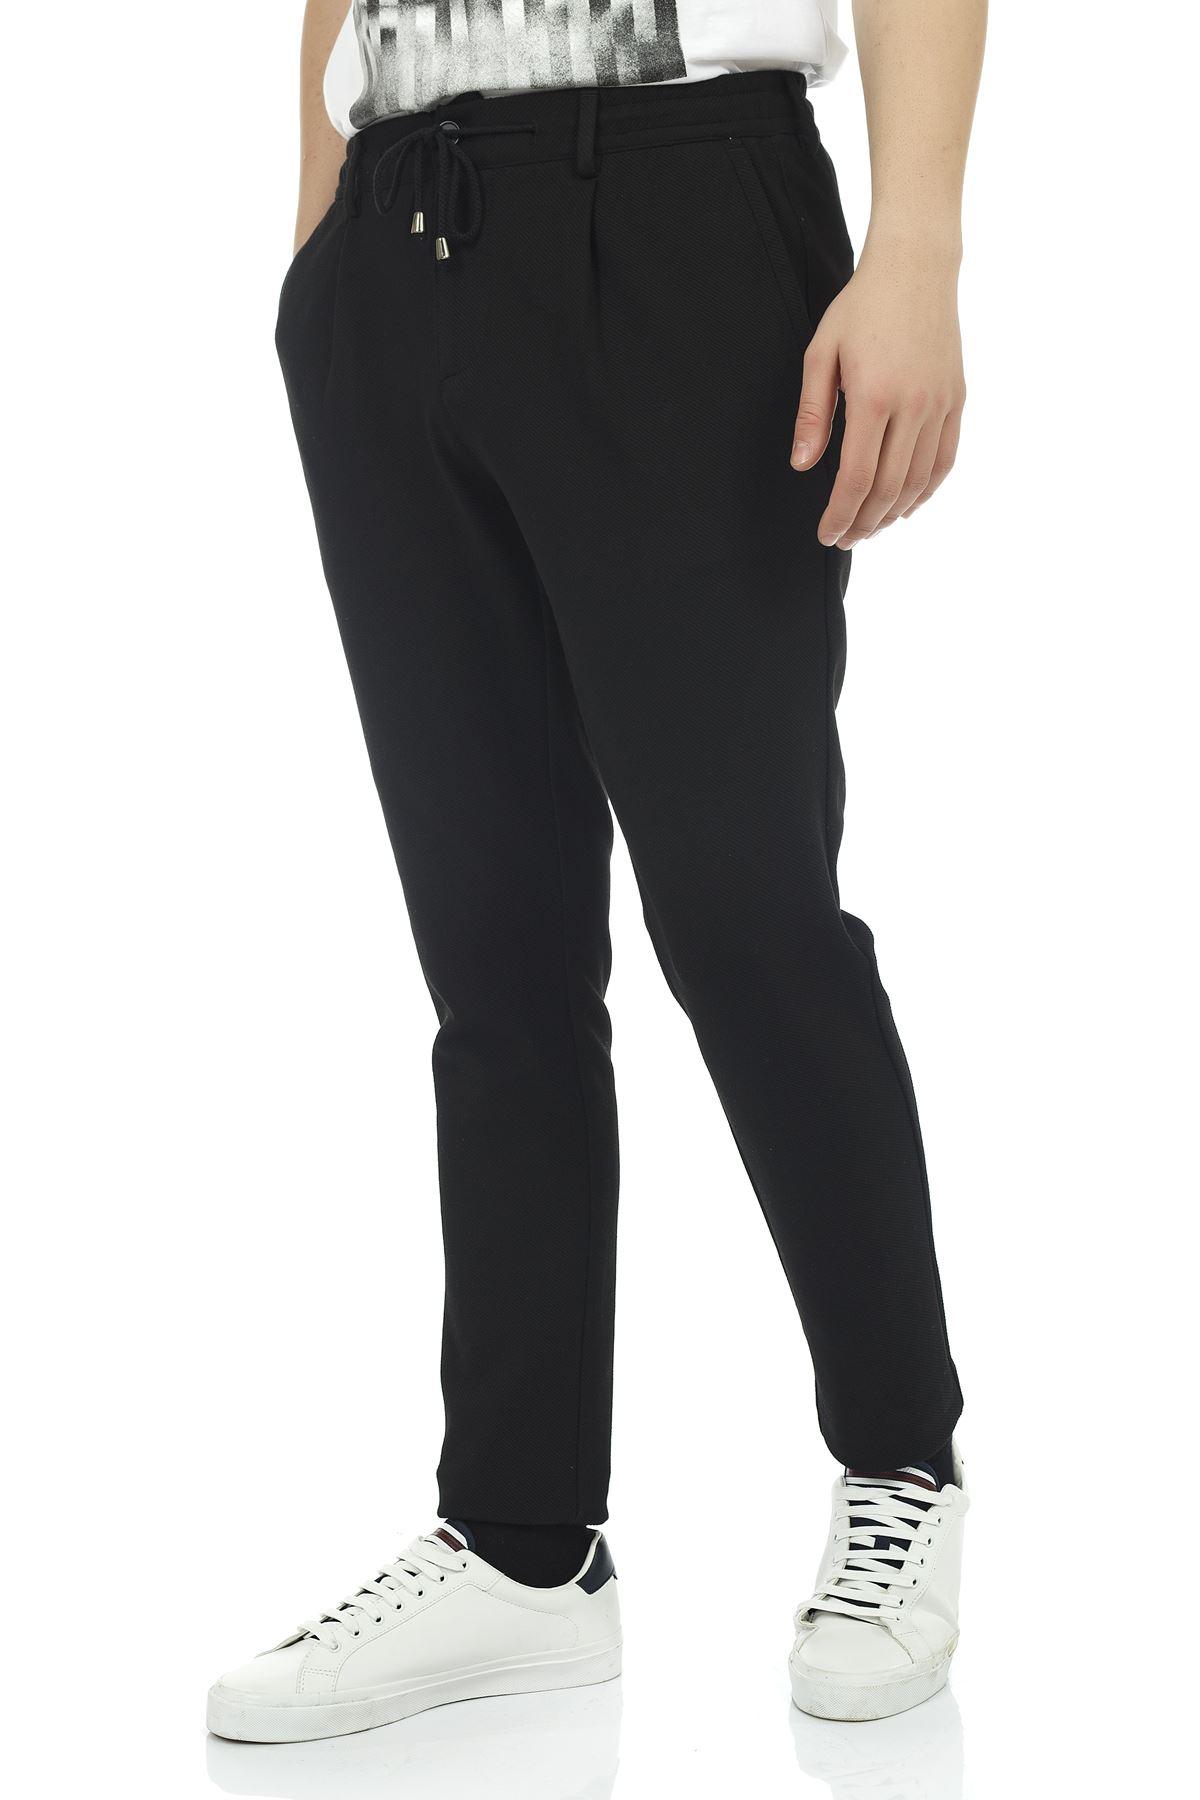 Siyah Beli Lastikli İpli Slim Kalıp Jogger Pantolon